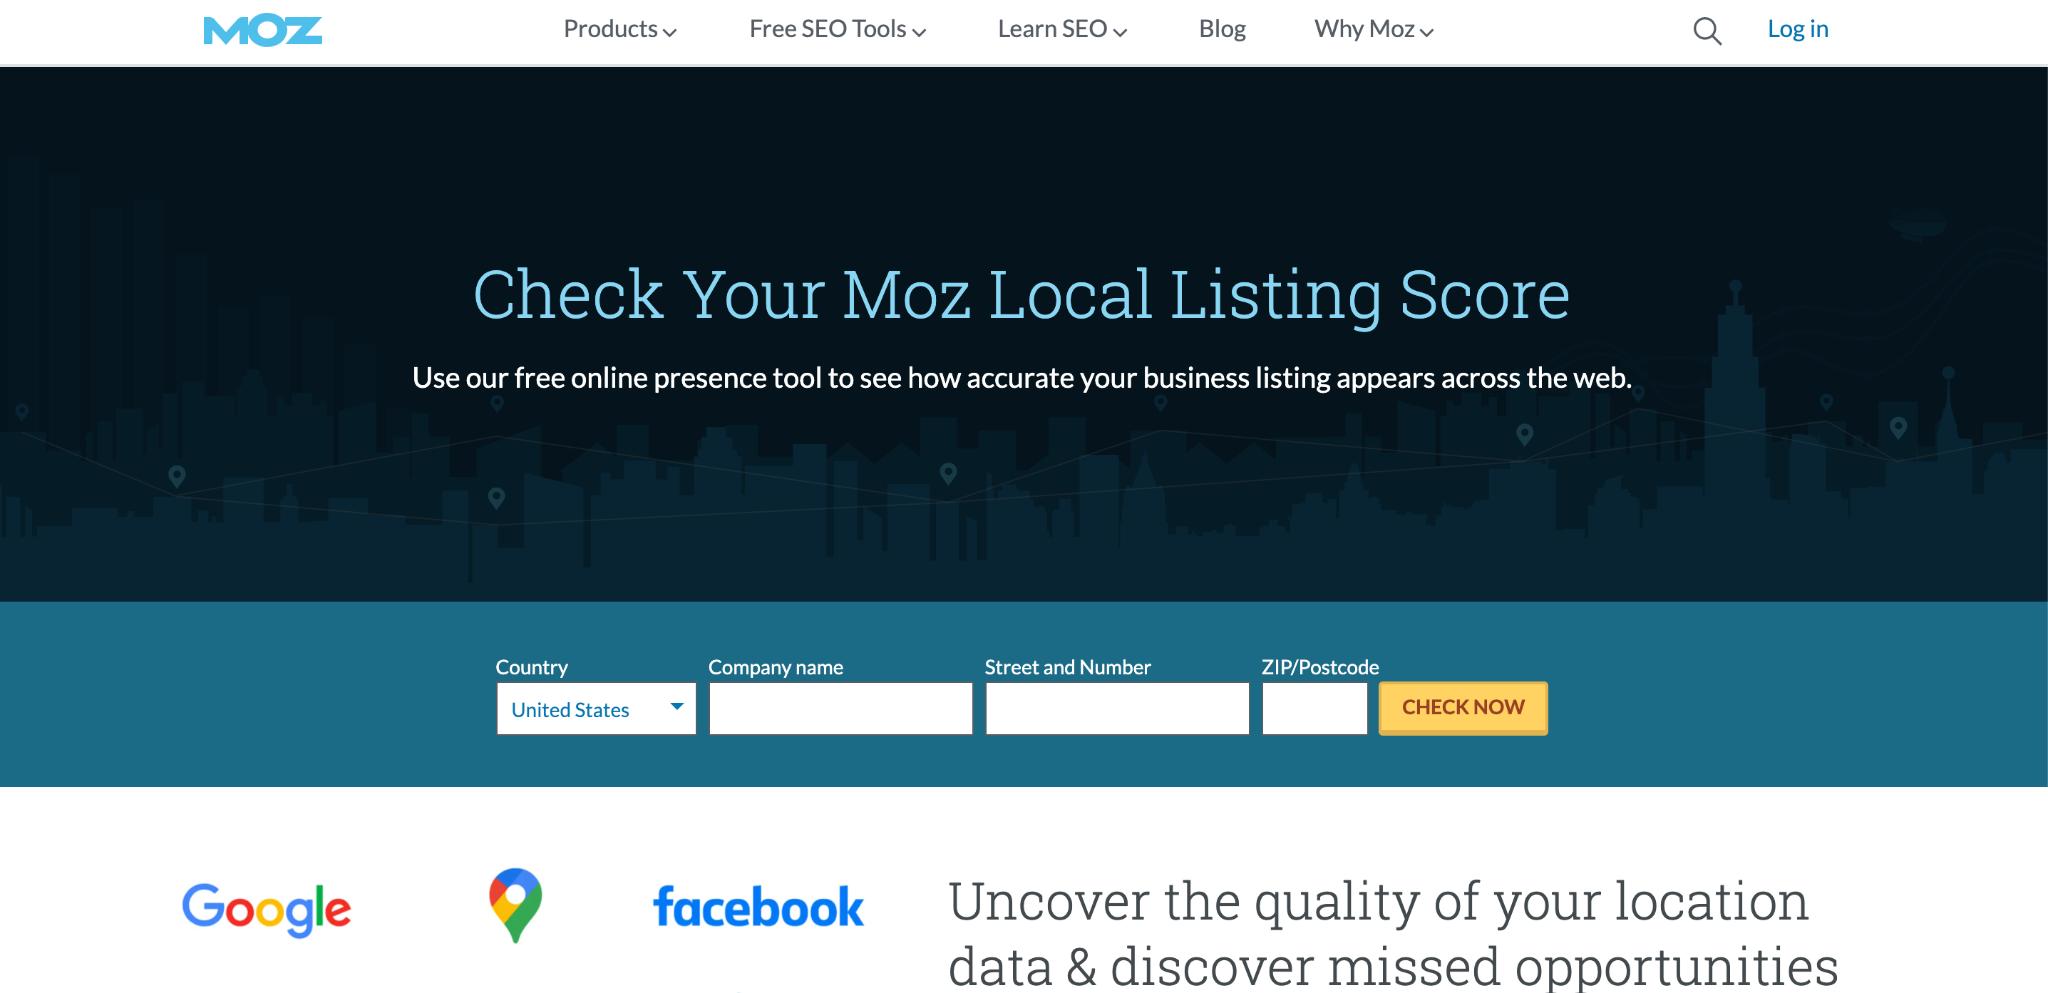 Moz Local Listing Score